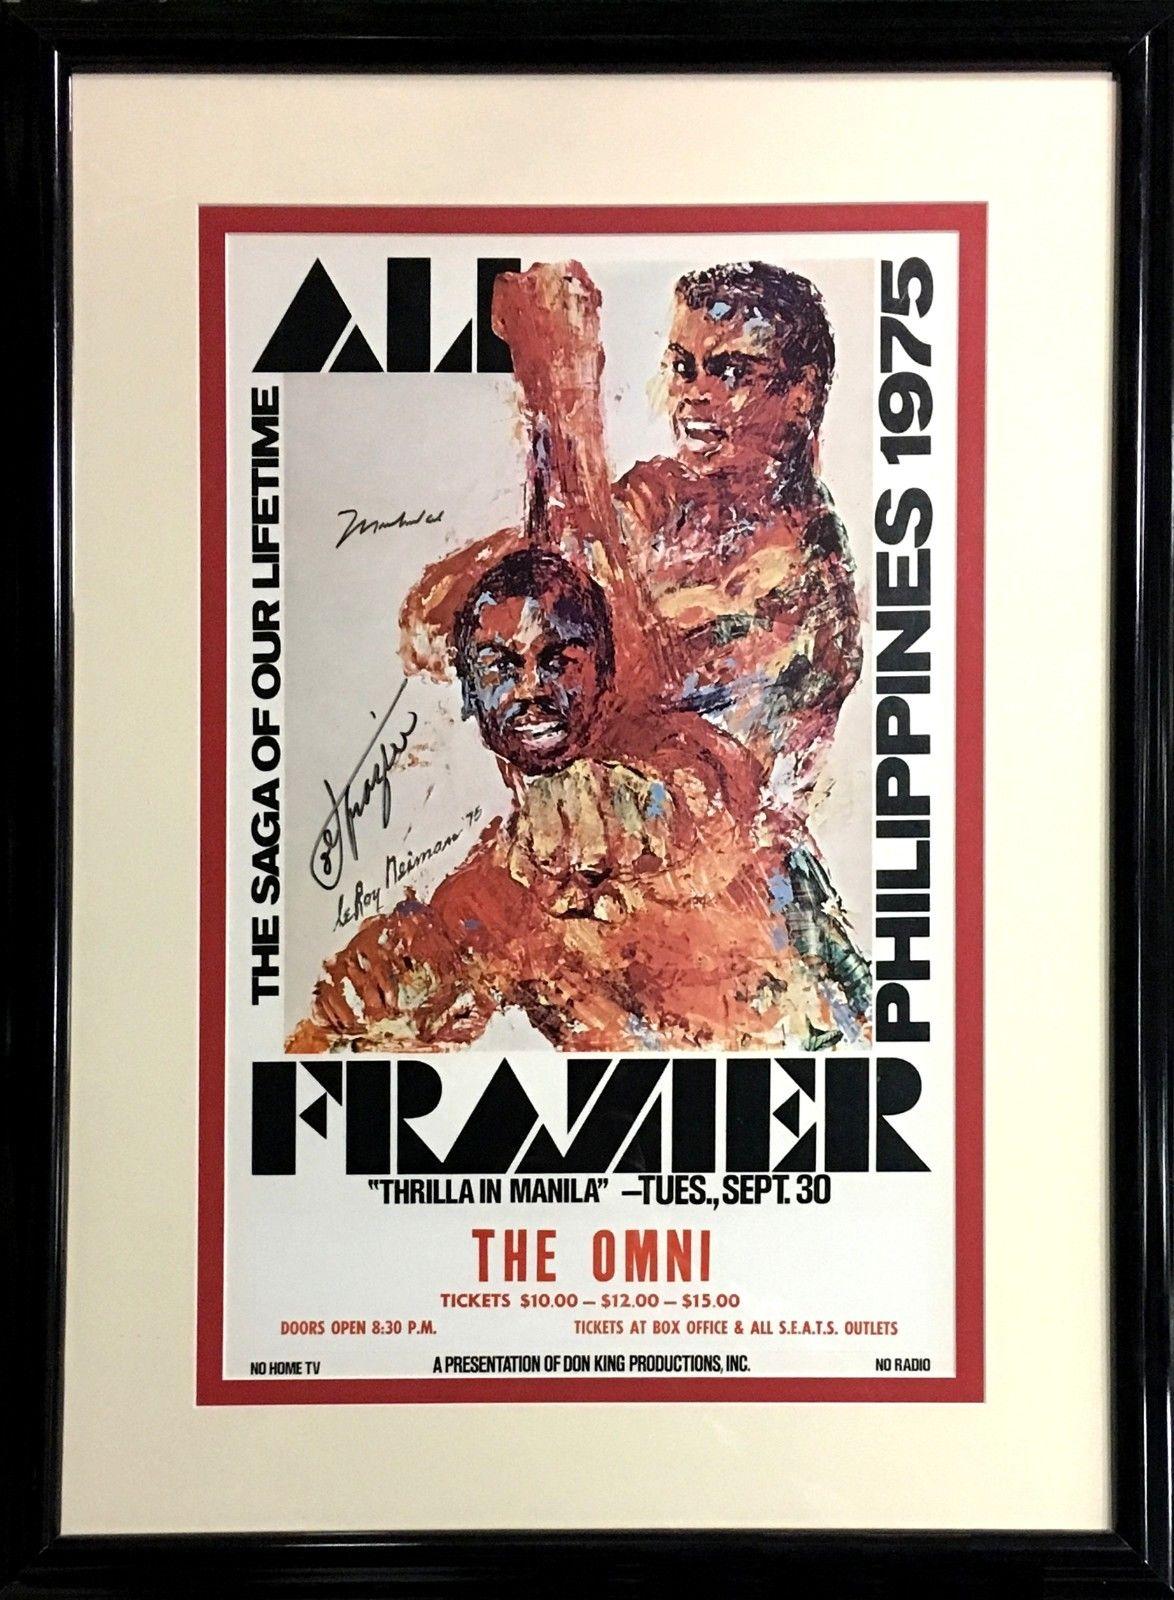 Muhammad Ali Joe Frazier Signed Leroy Neiman Manila fight poster 2 auto COA